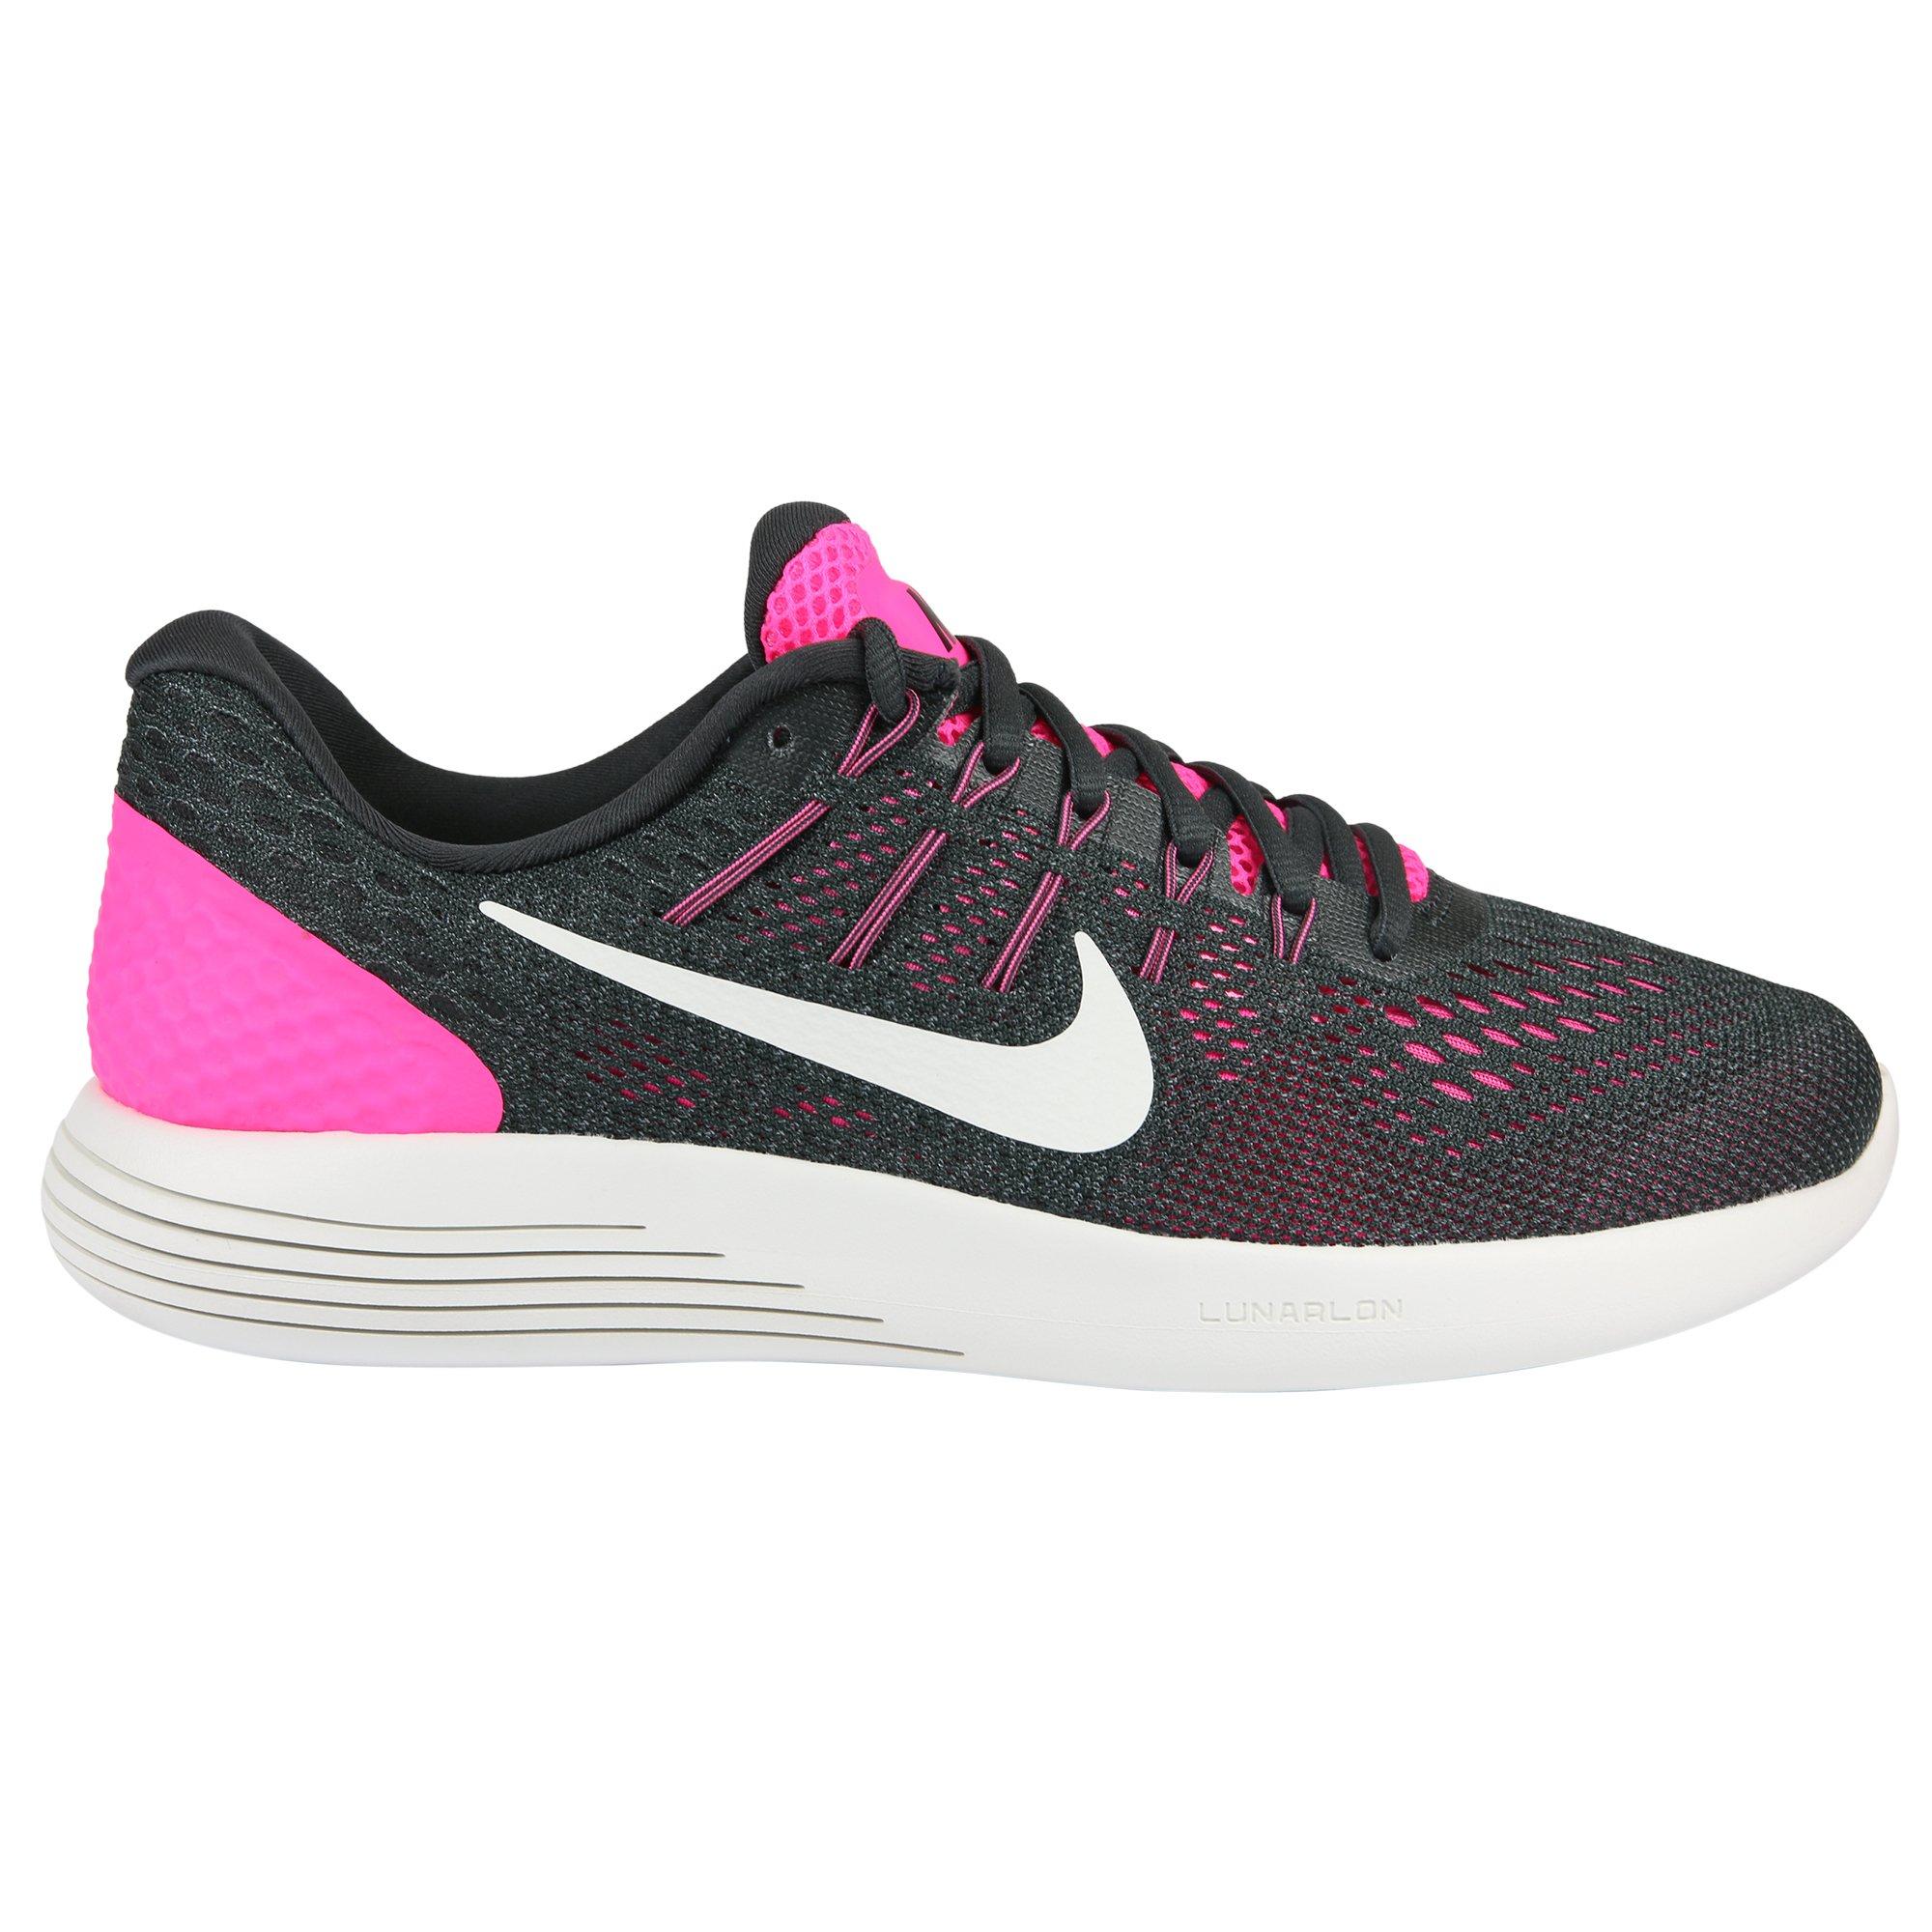 Nike Womens Lunarglide 8 Pink Blast/Summit White Running Shoe 9.5 Women US